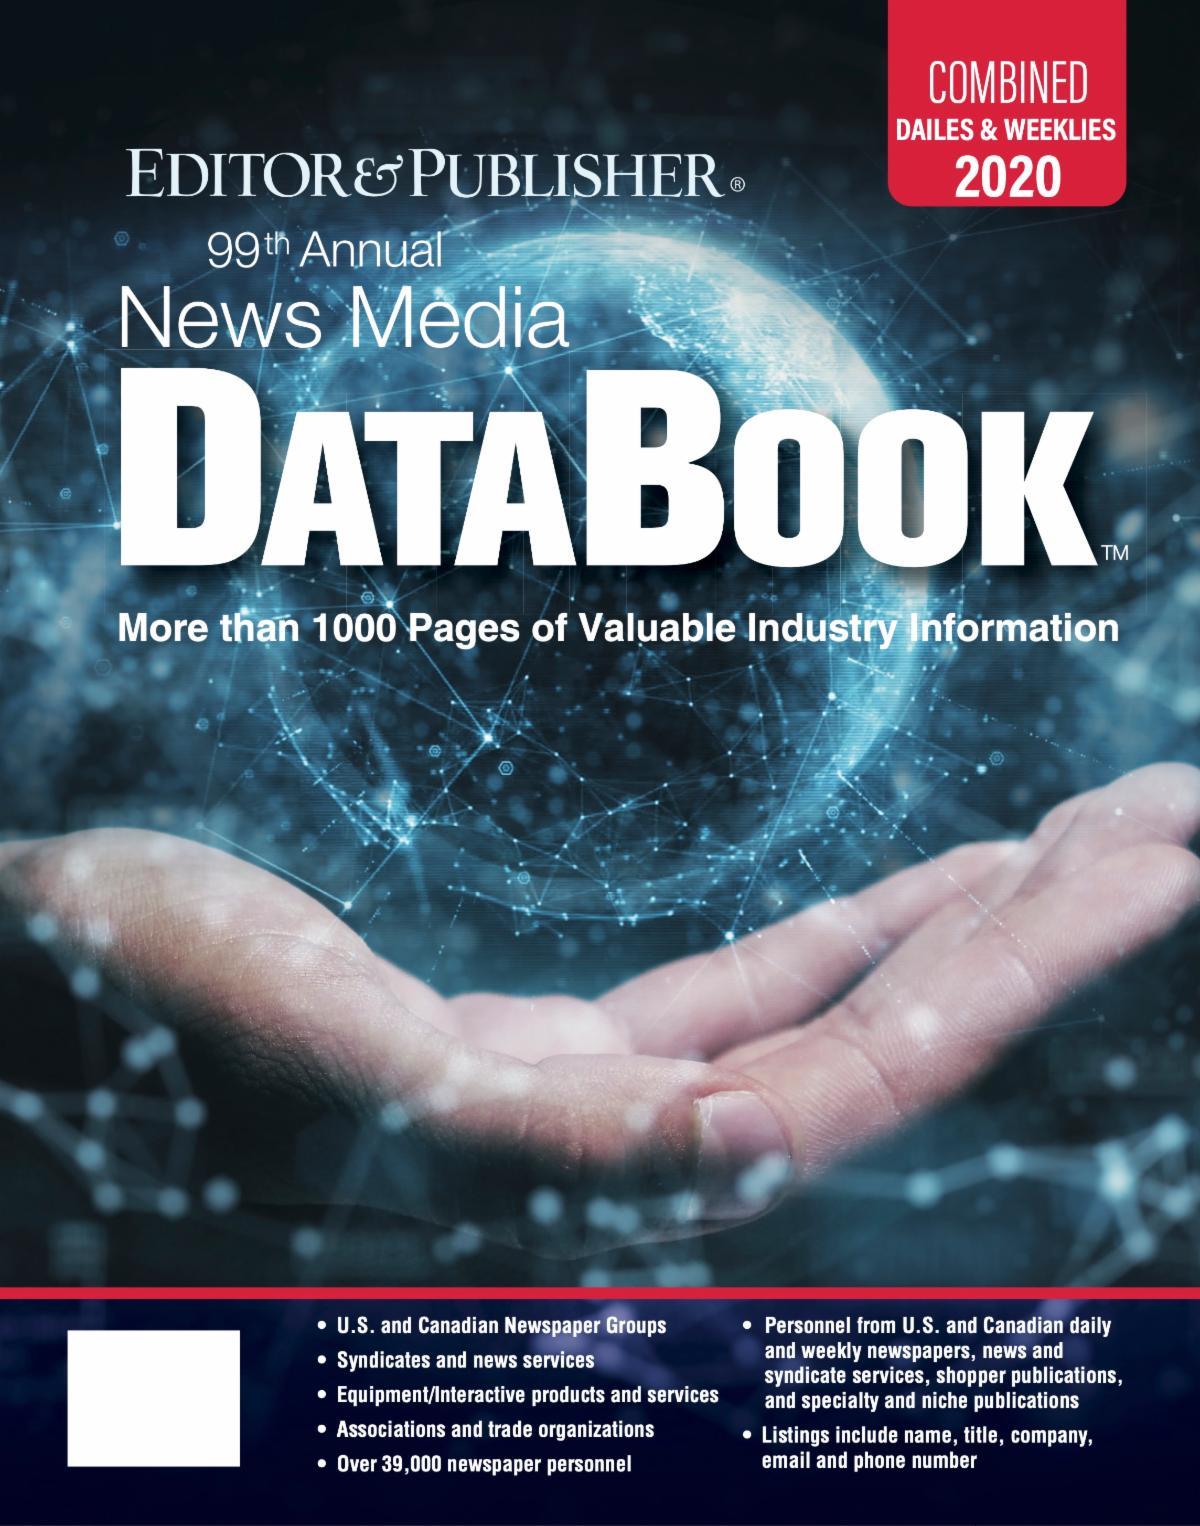 Databook-2020-Cover_aug20_ed_OY.jpg